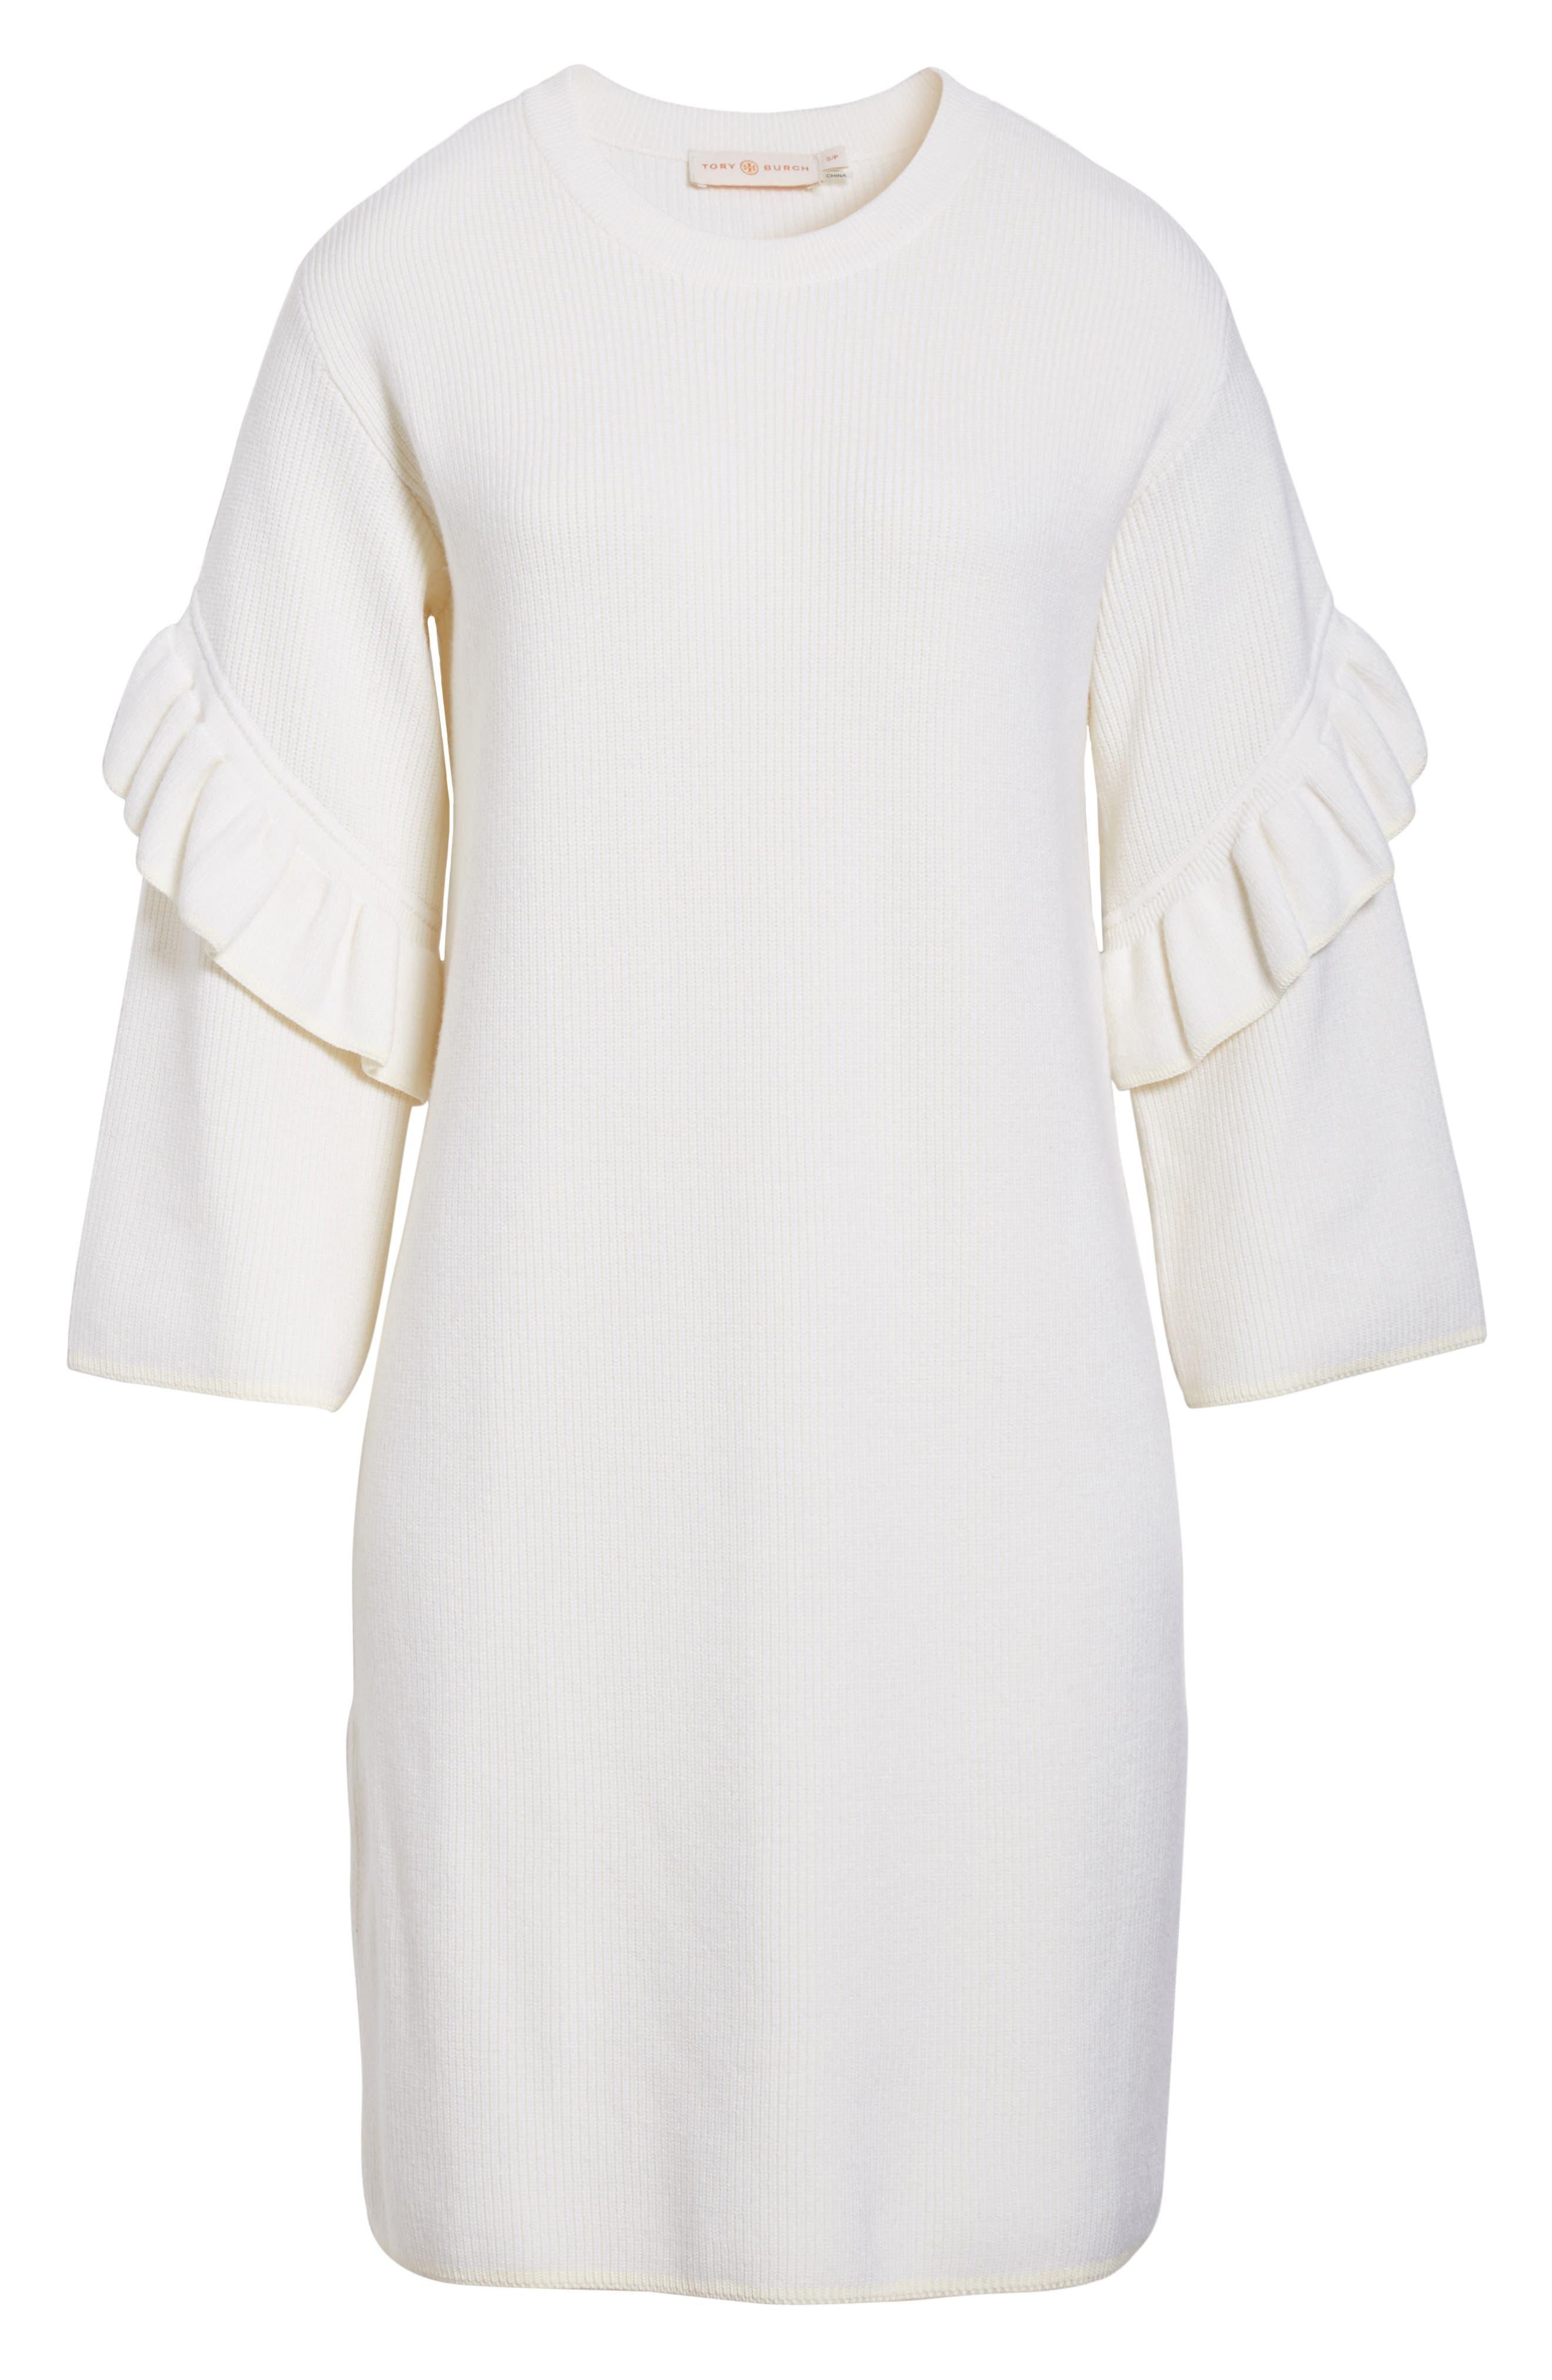 Ashley Sweater Dress,                             Alternate thumbnail 6, color,                             904